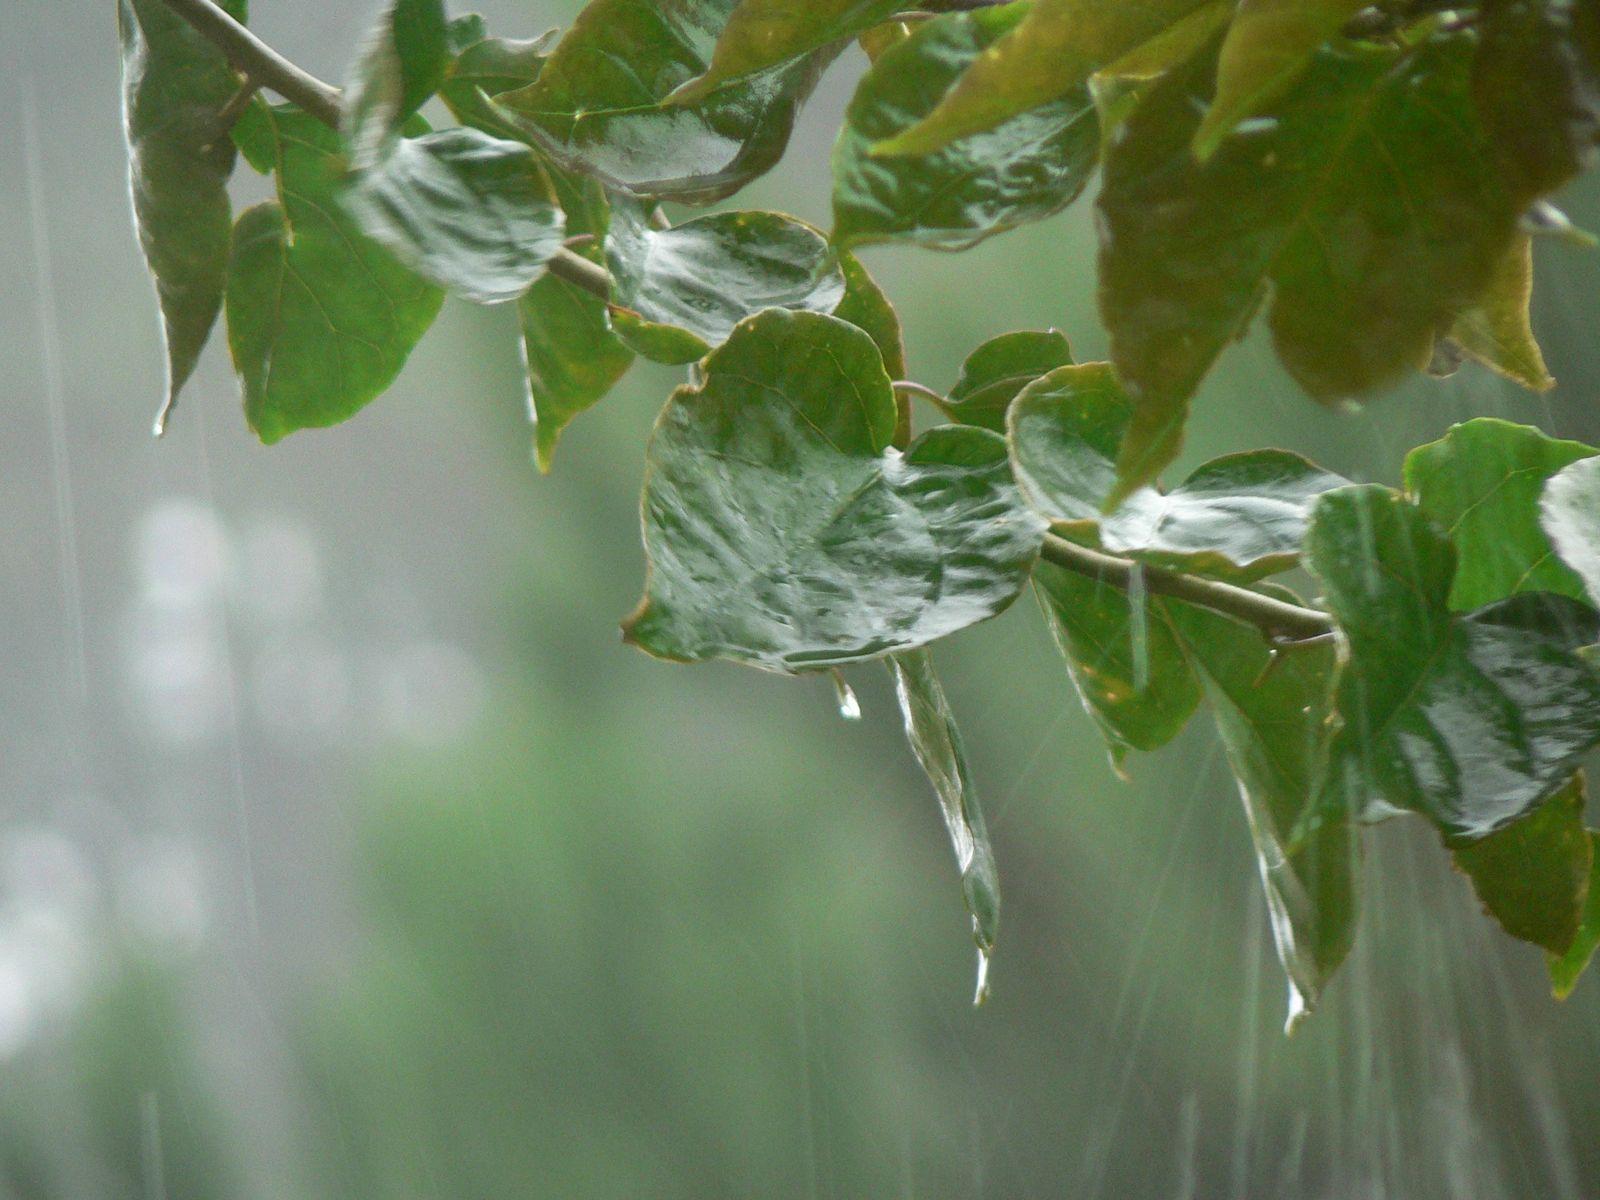 hd deskcomautumn rain wallpaperautumn rain wallpaper 1024 768html 1600x1200